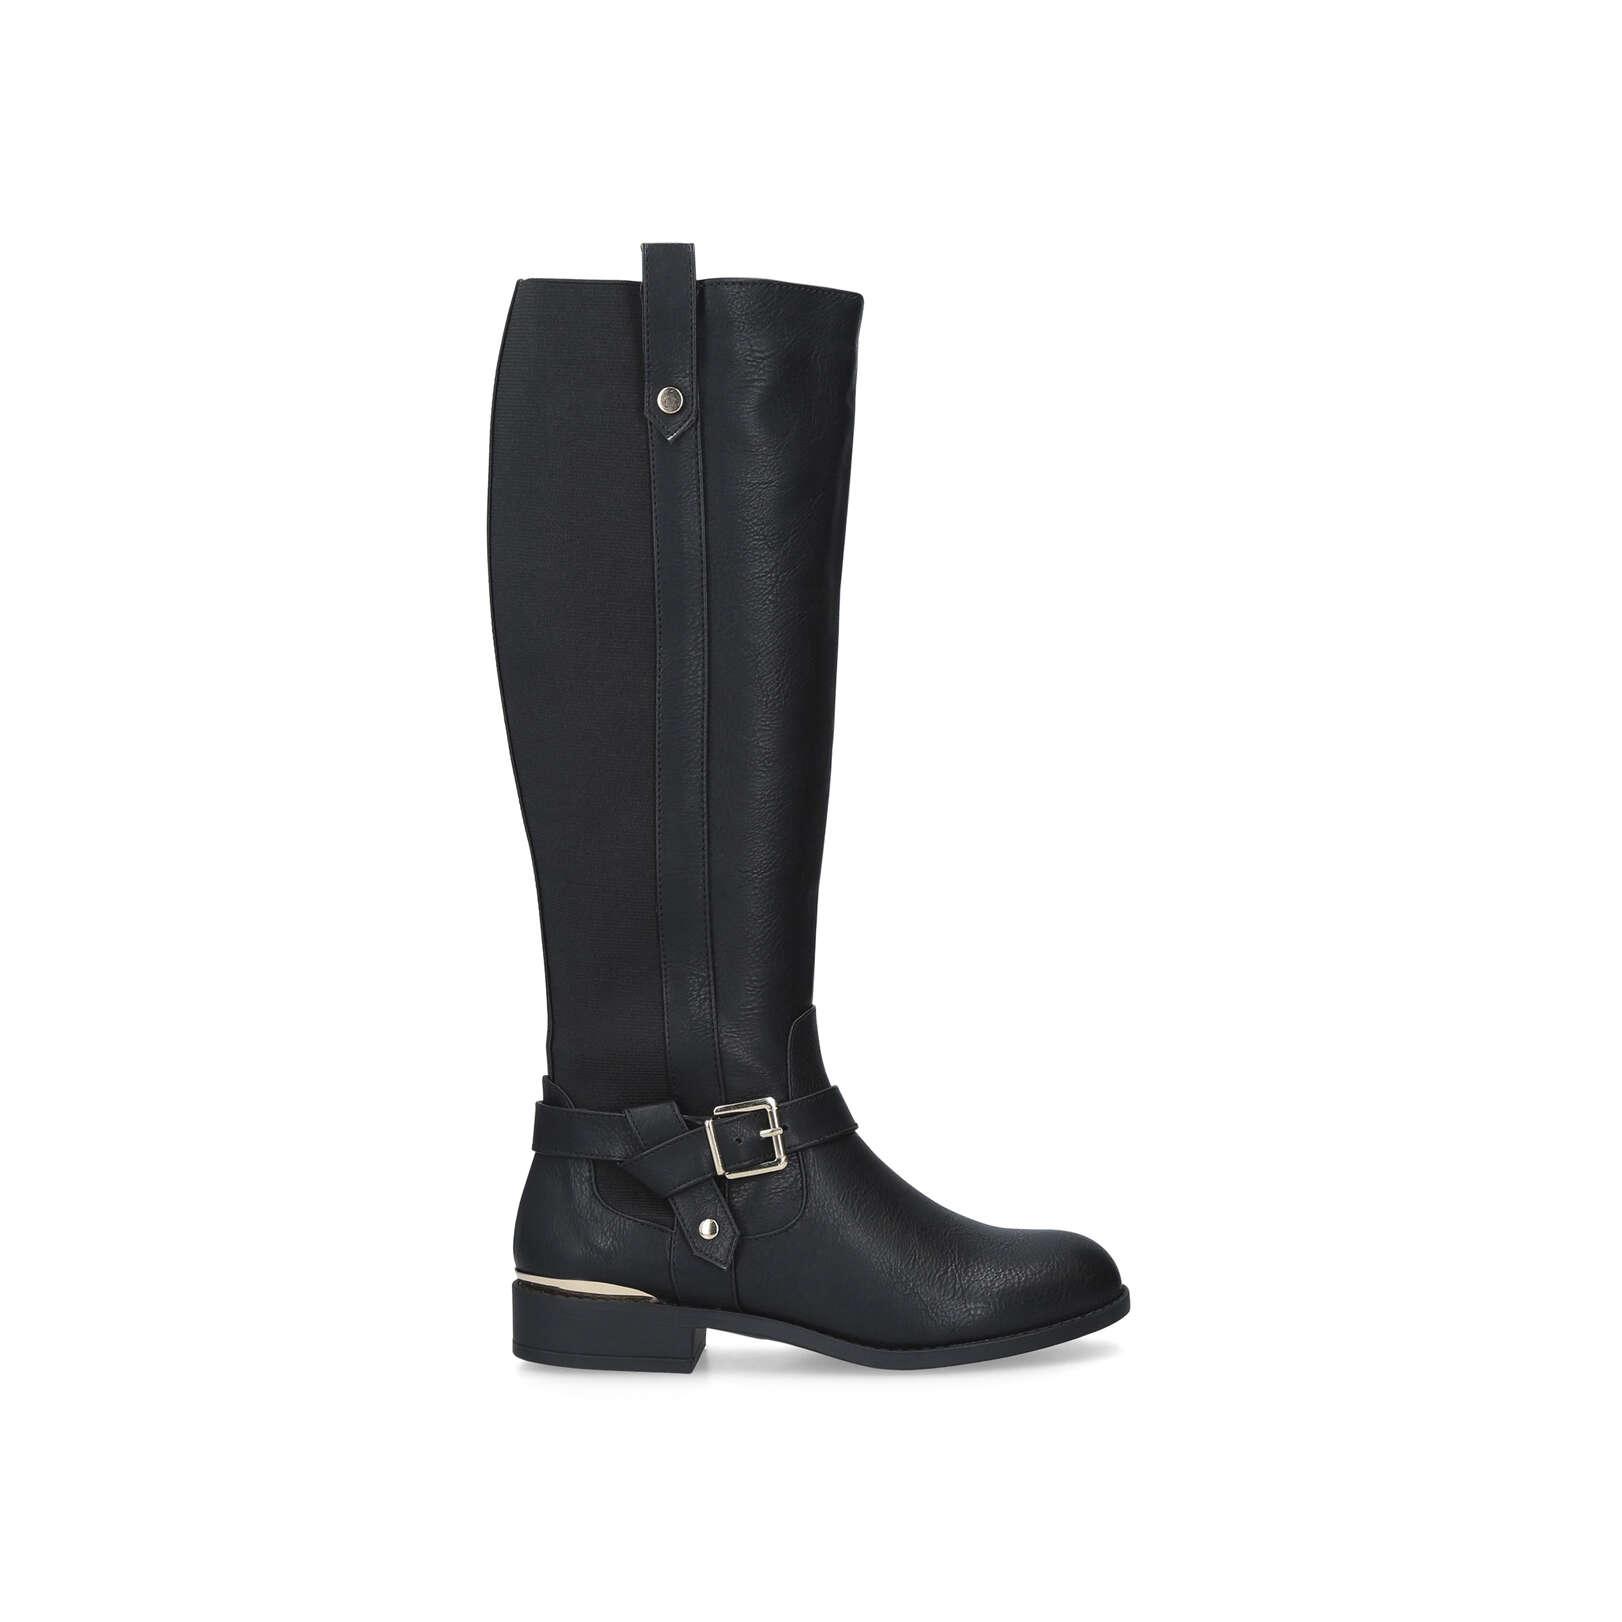 55a0a3dde32 TAYLOR Taylor No Heel High Leg Boots Carvela Comfort Black by CARVELA  COMFORT